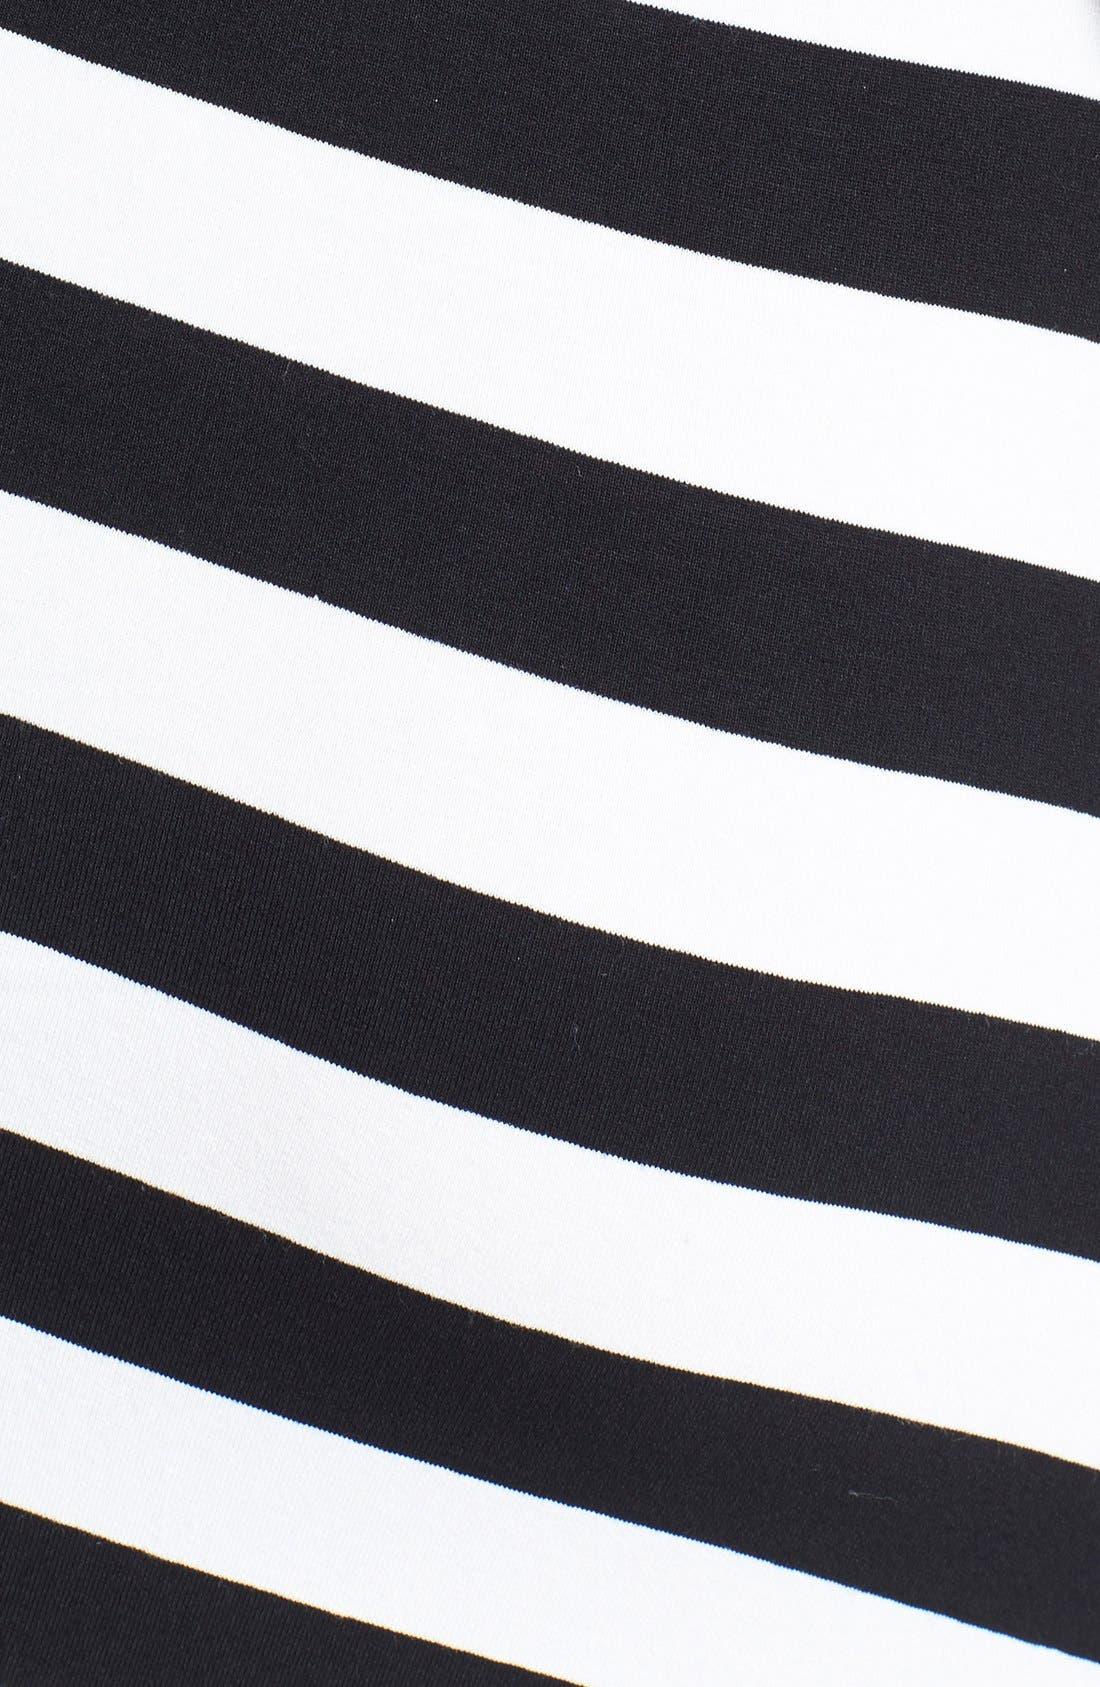 Alternate Image 3  - Bardot Stripe Maxi Dress (Nordstrom Exclusive)